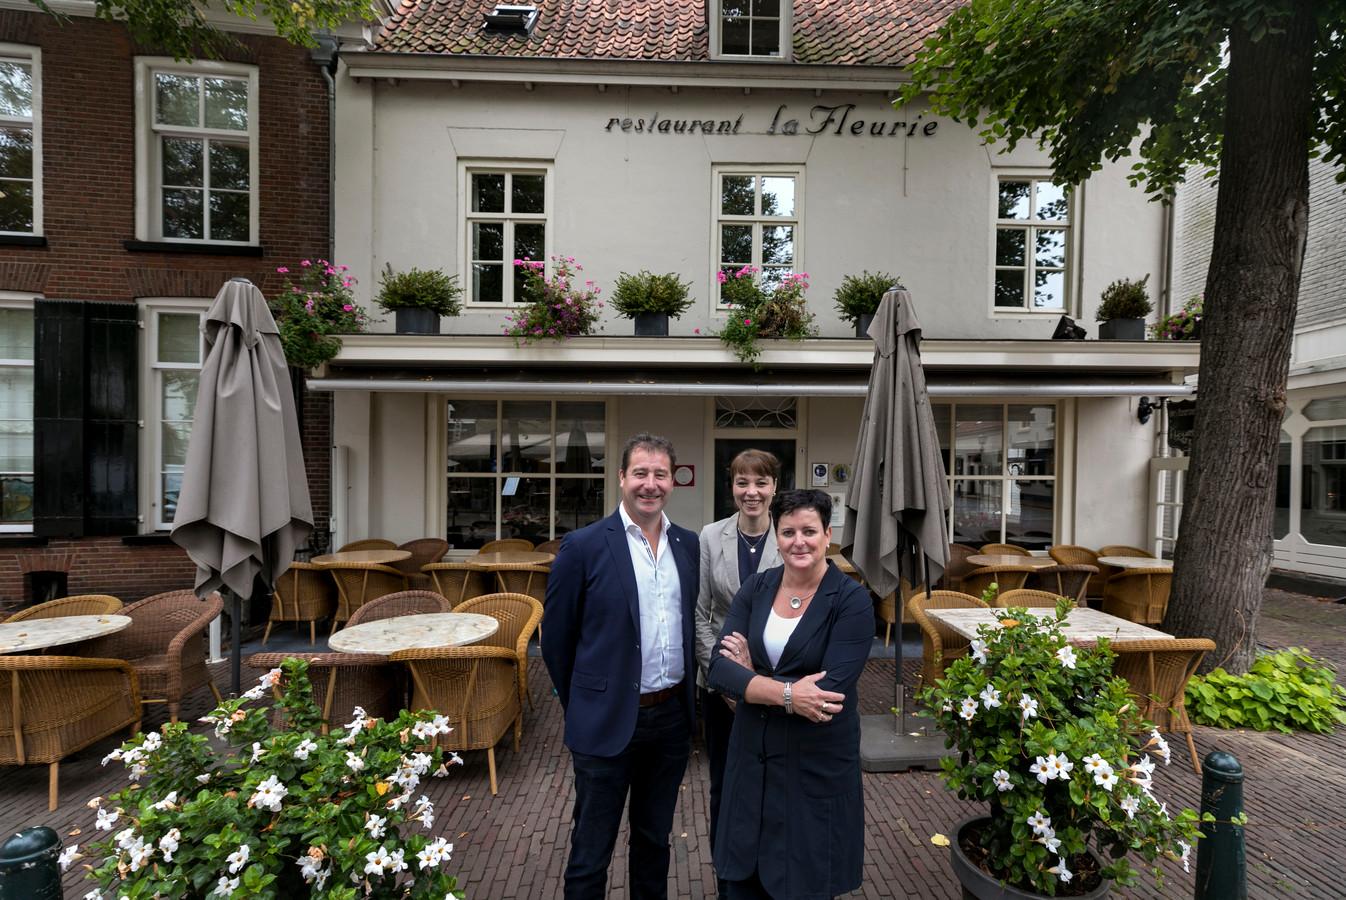 Martino Verbruggen, Sylvia Streumer en Loes Verbruggen (v.l.n.r.) voor restaurant La Fleurie in Oirschot.